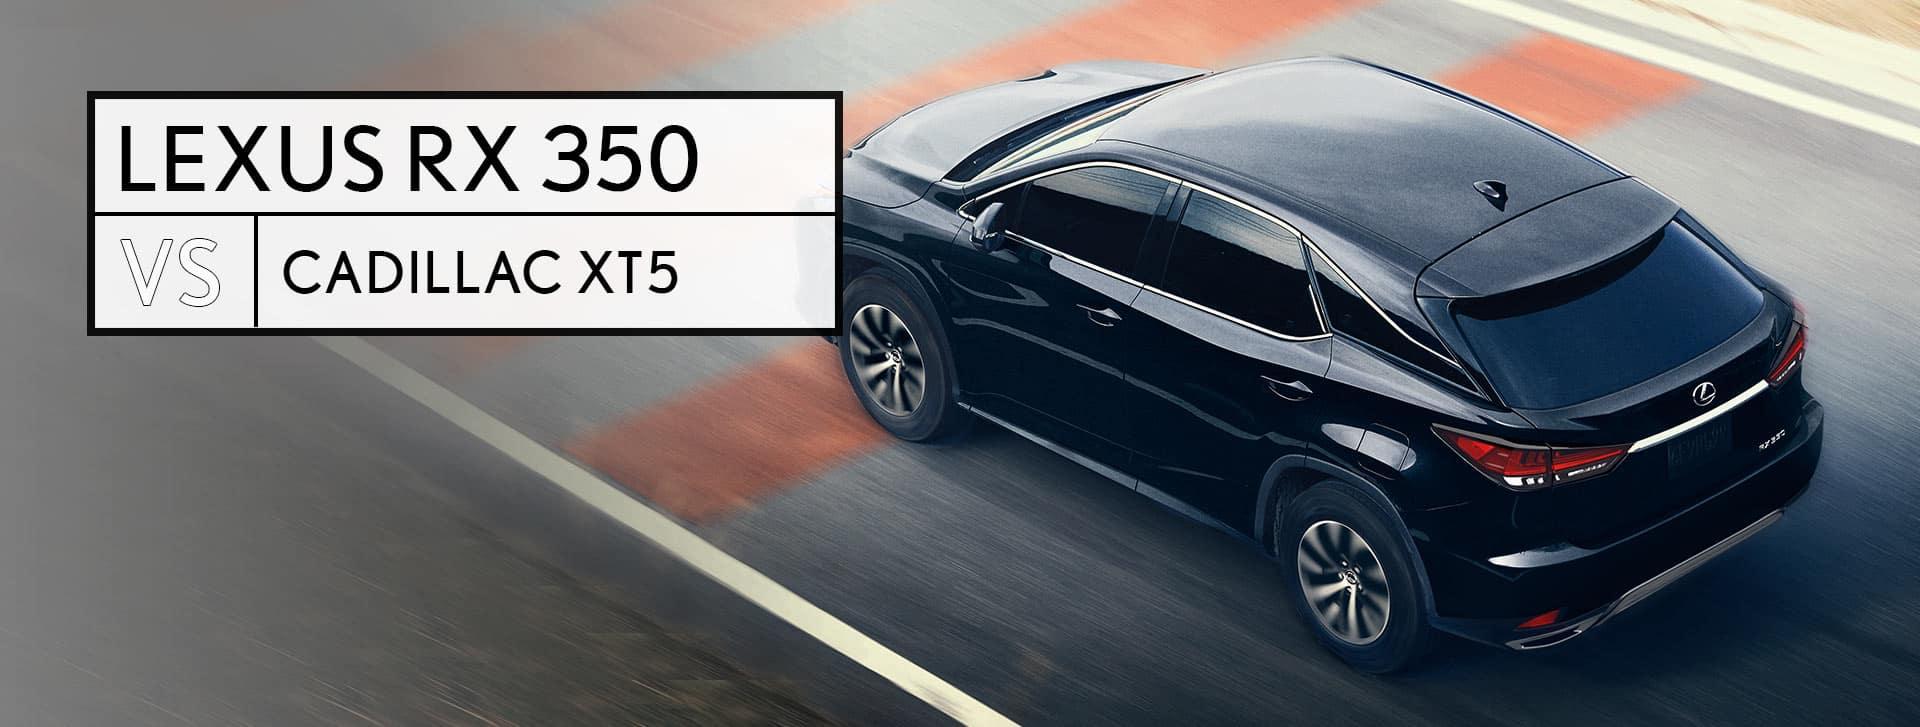 Lexus RX vs Cadillac XT5 Utica MI